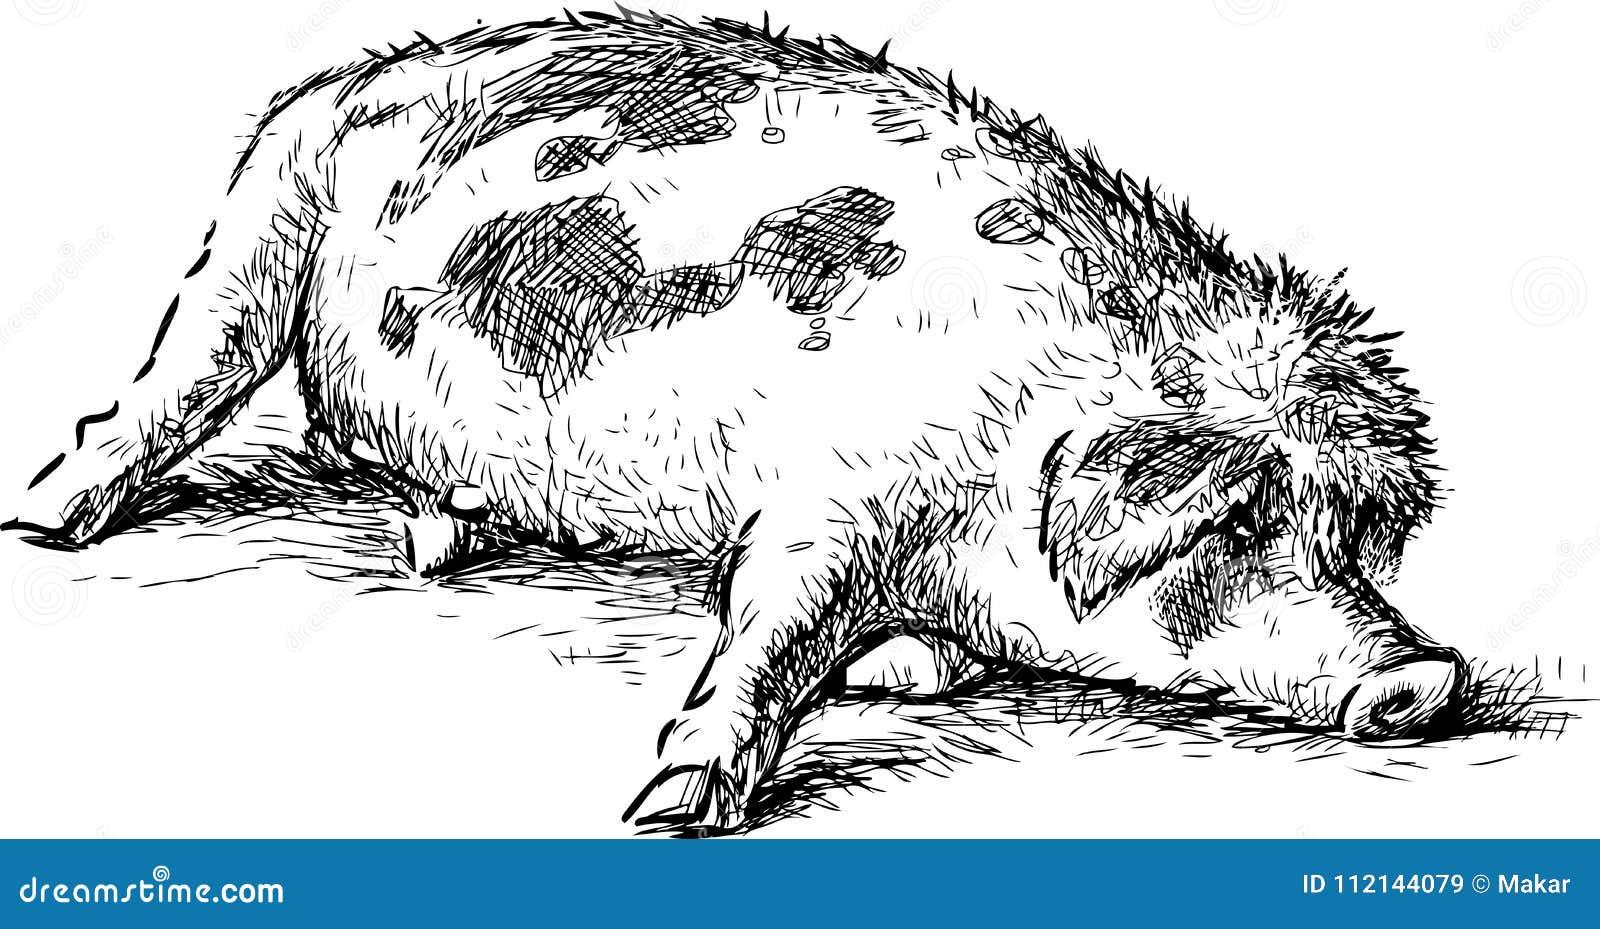 Sketch of sleeping lazy cartoon pig